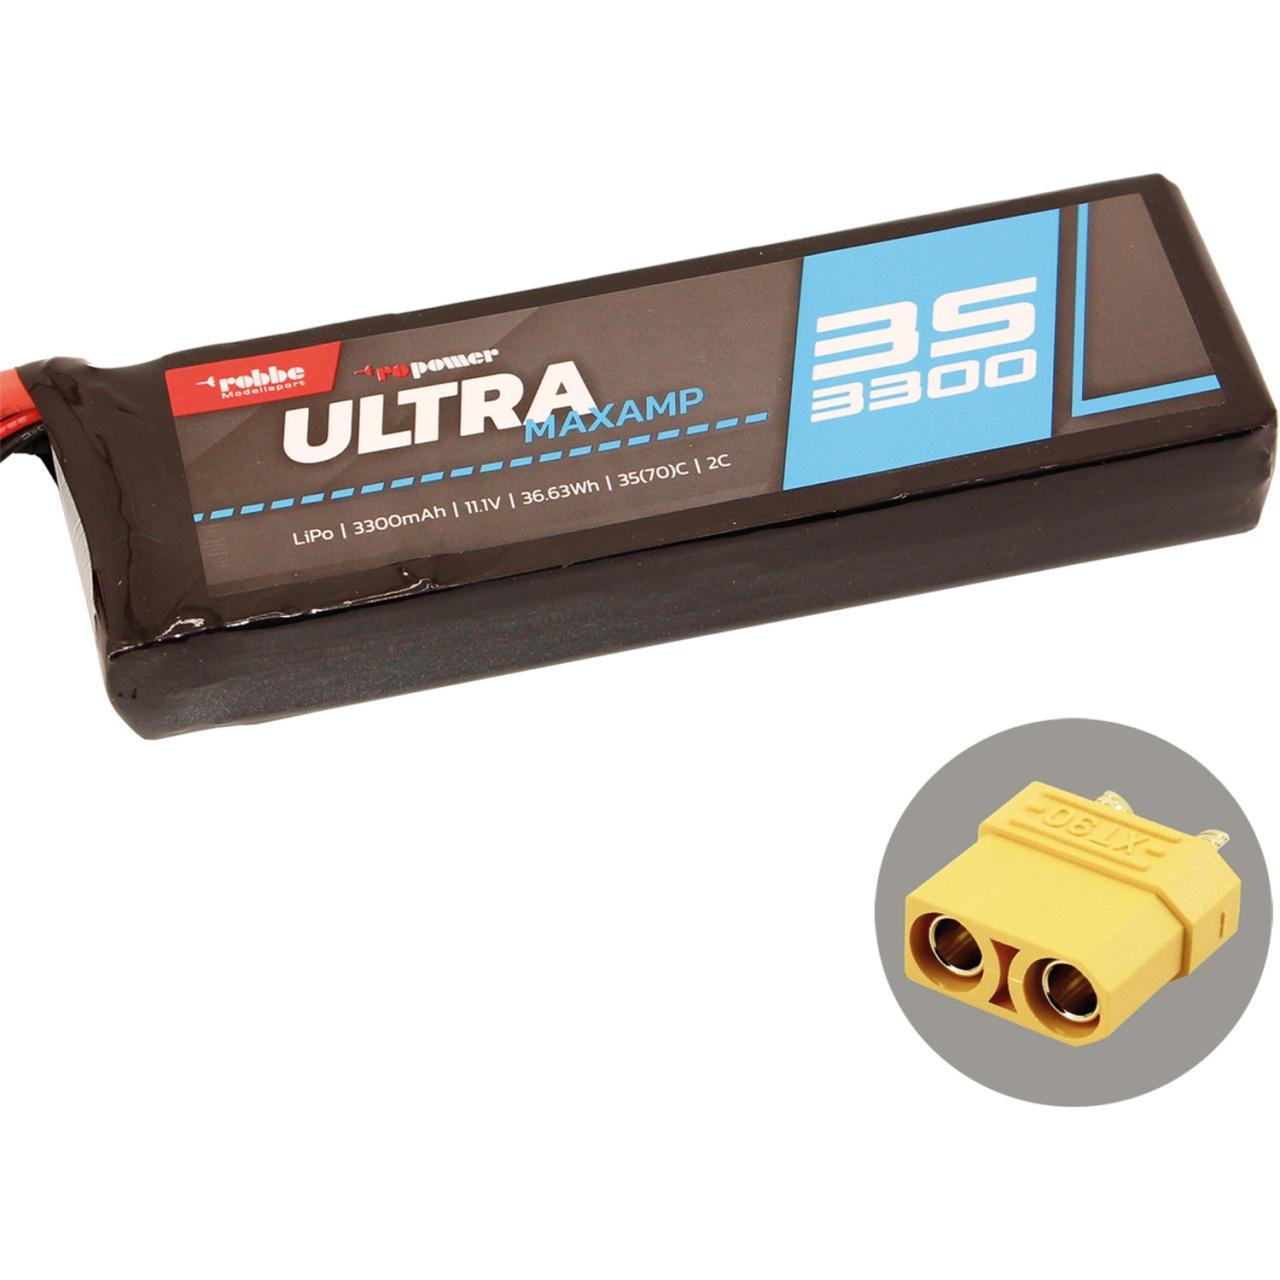 Ultra Max Amp 3S 3300mAh